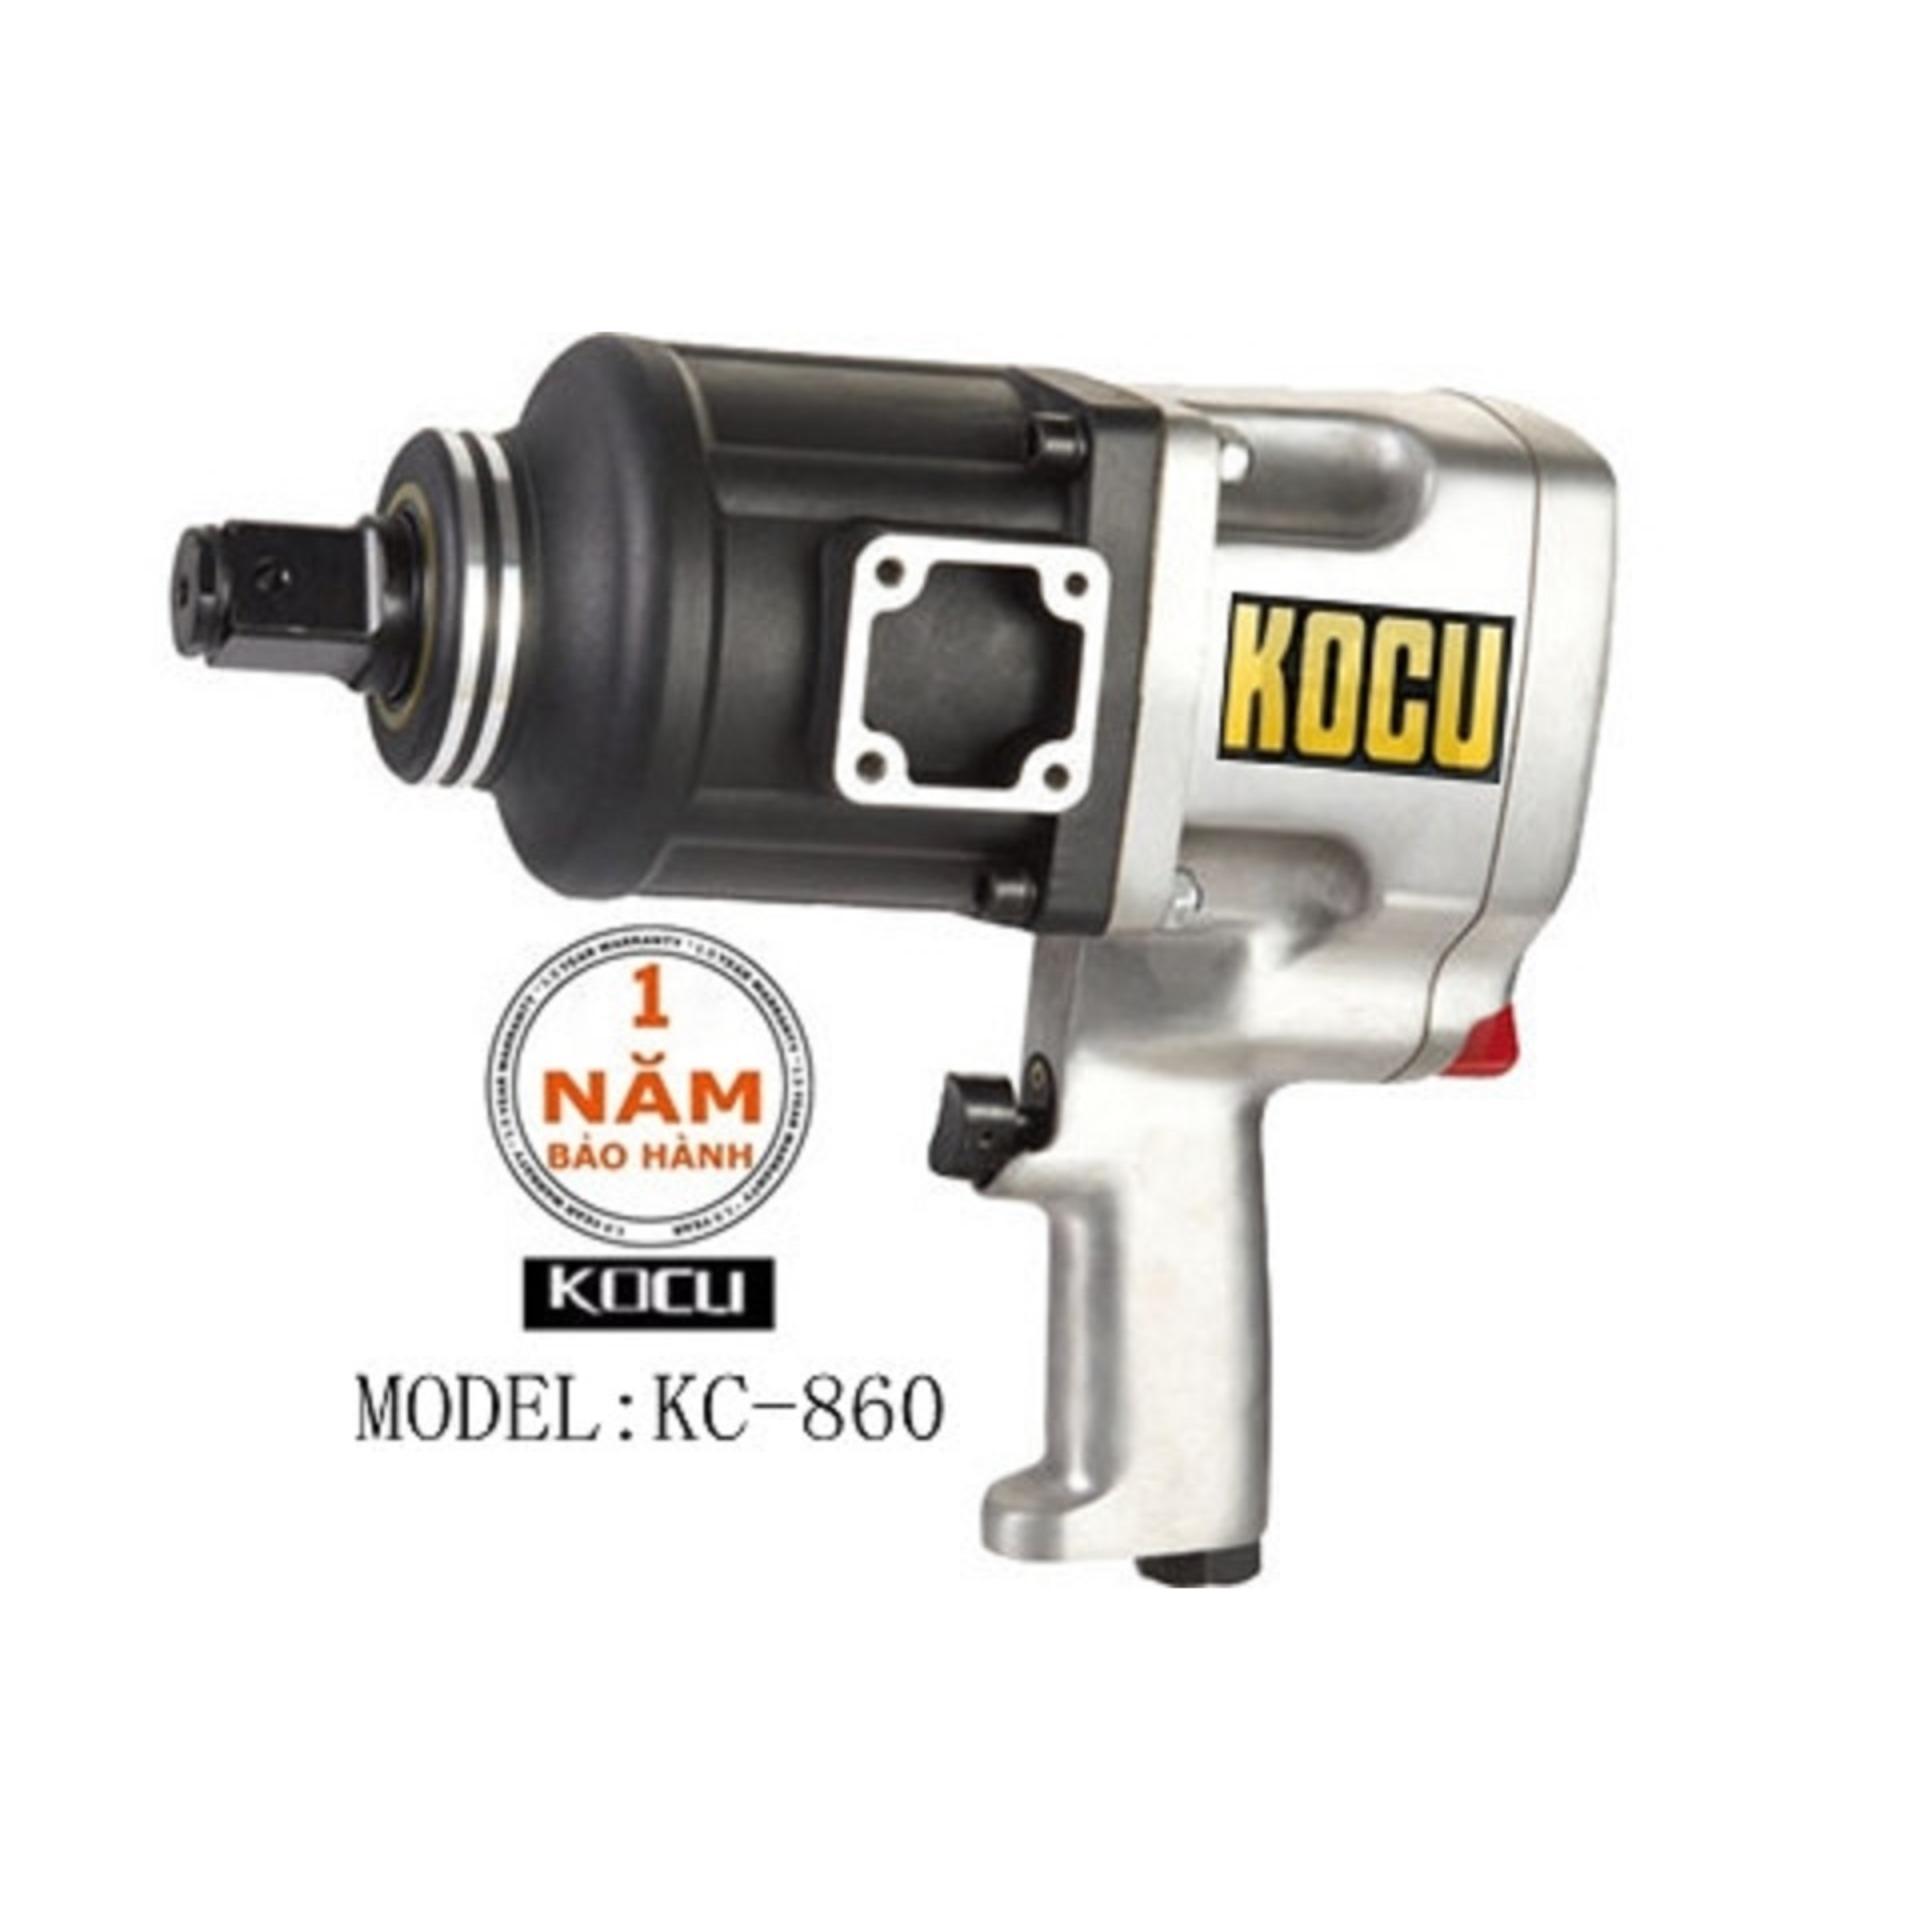 VẶN BULÔNG 1''INCH NGẮN KOCU MODEL: KC-860